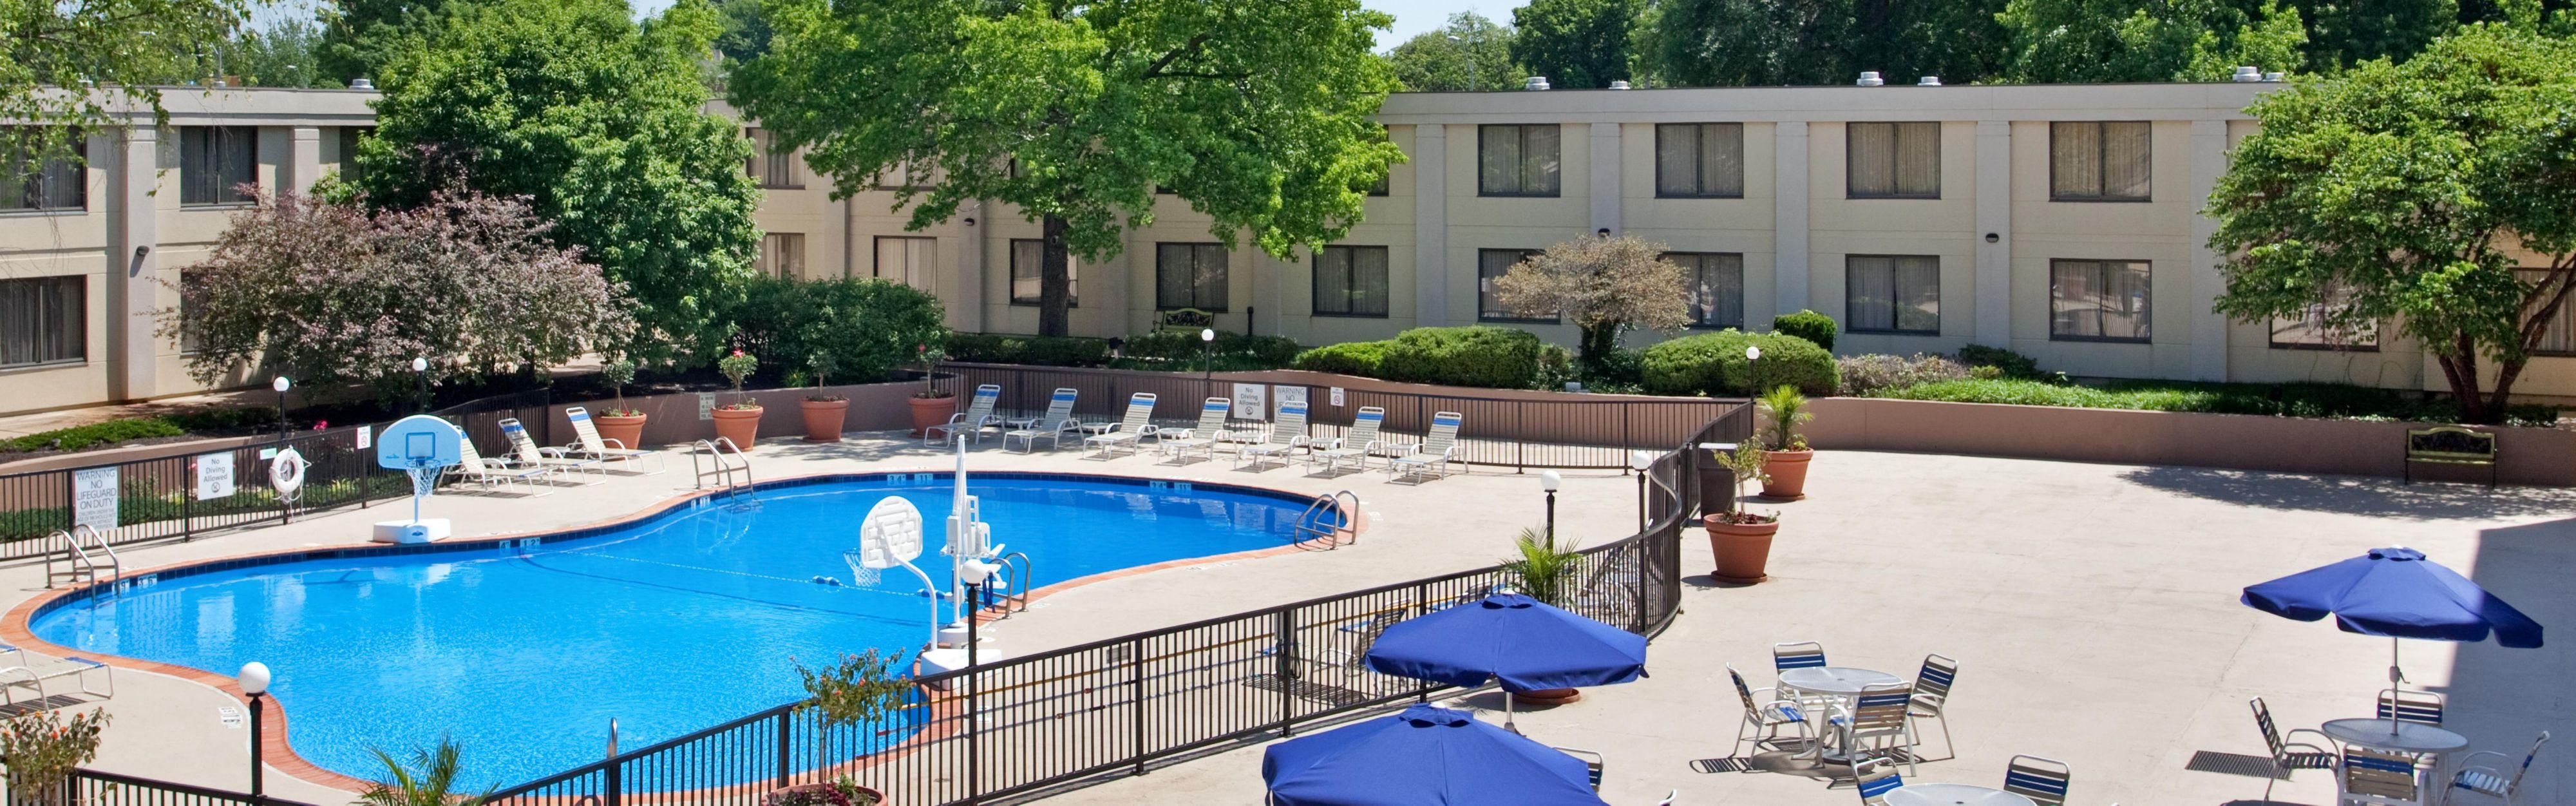 Holiday Inn Country Club Plaza Hotel Kansas City